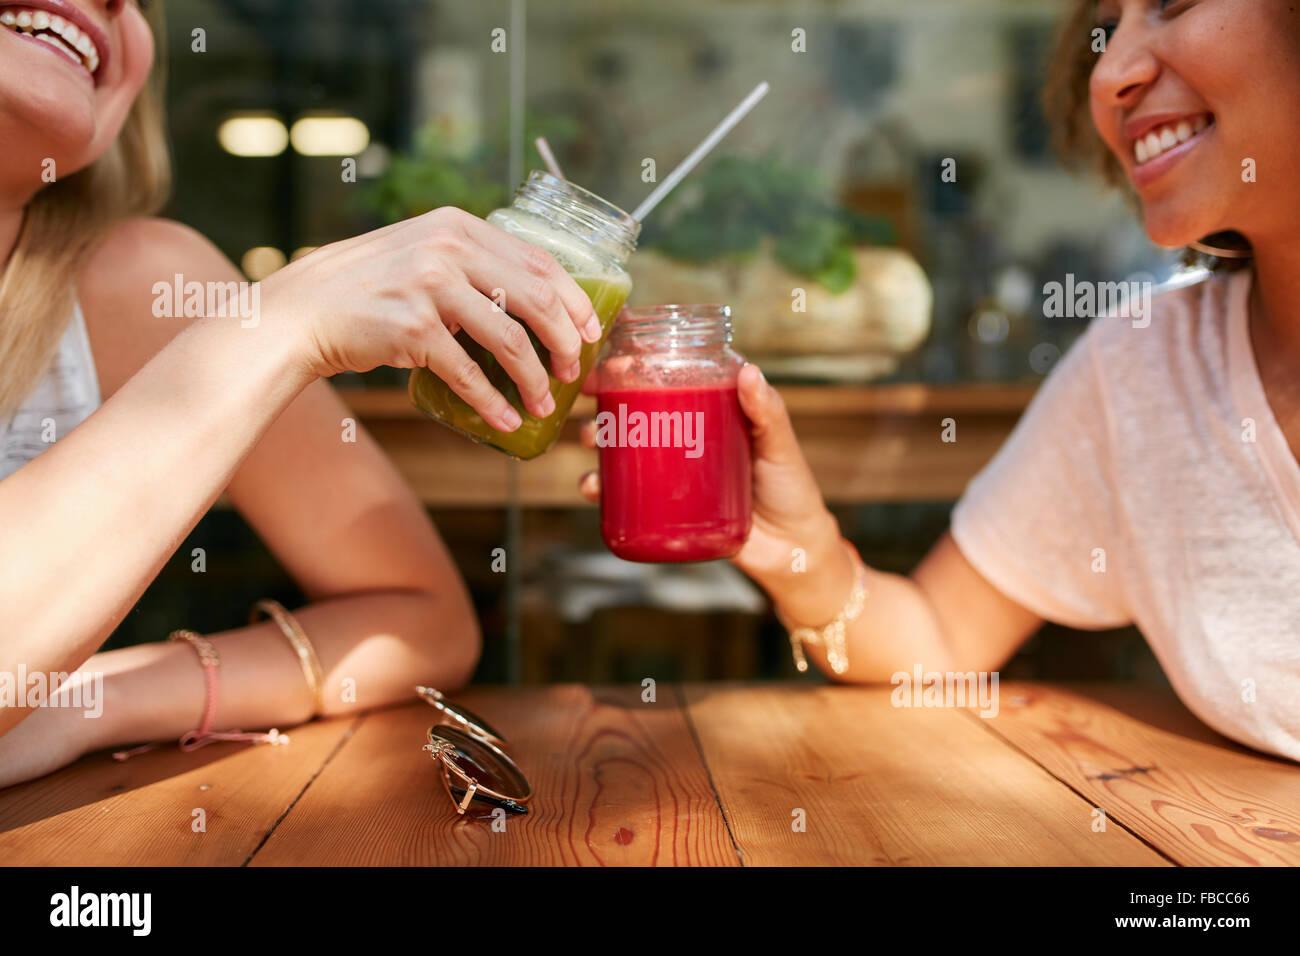 Close up shot of female friends toasting juice glasses at sidewalk cafe. Two happy women enjoying fresh drinks at - Stock Image